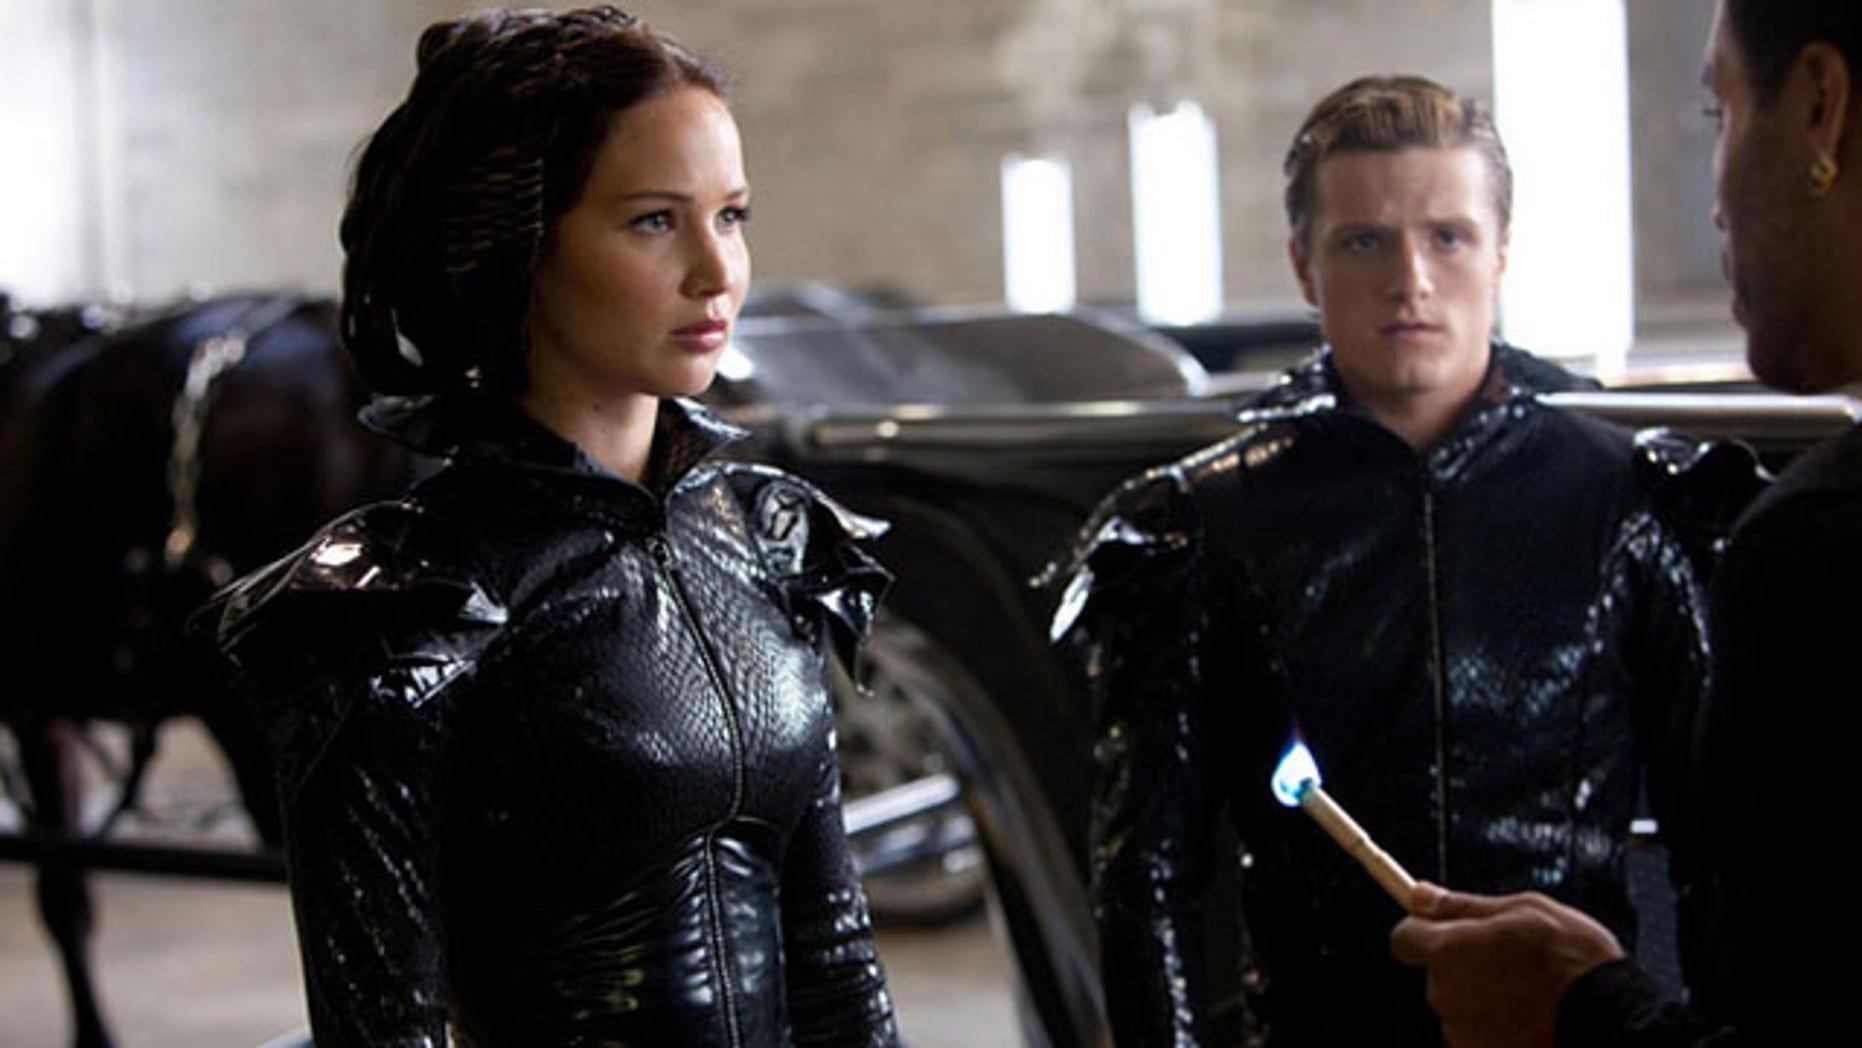 """Hunger Games"" heroine Katniss Everdeen and fellow tribute Peeta Mellark wait to be lit on fire before making their fiery public debut."